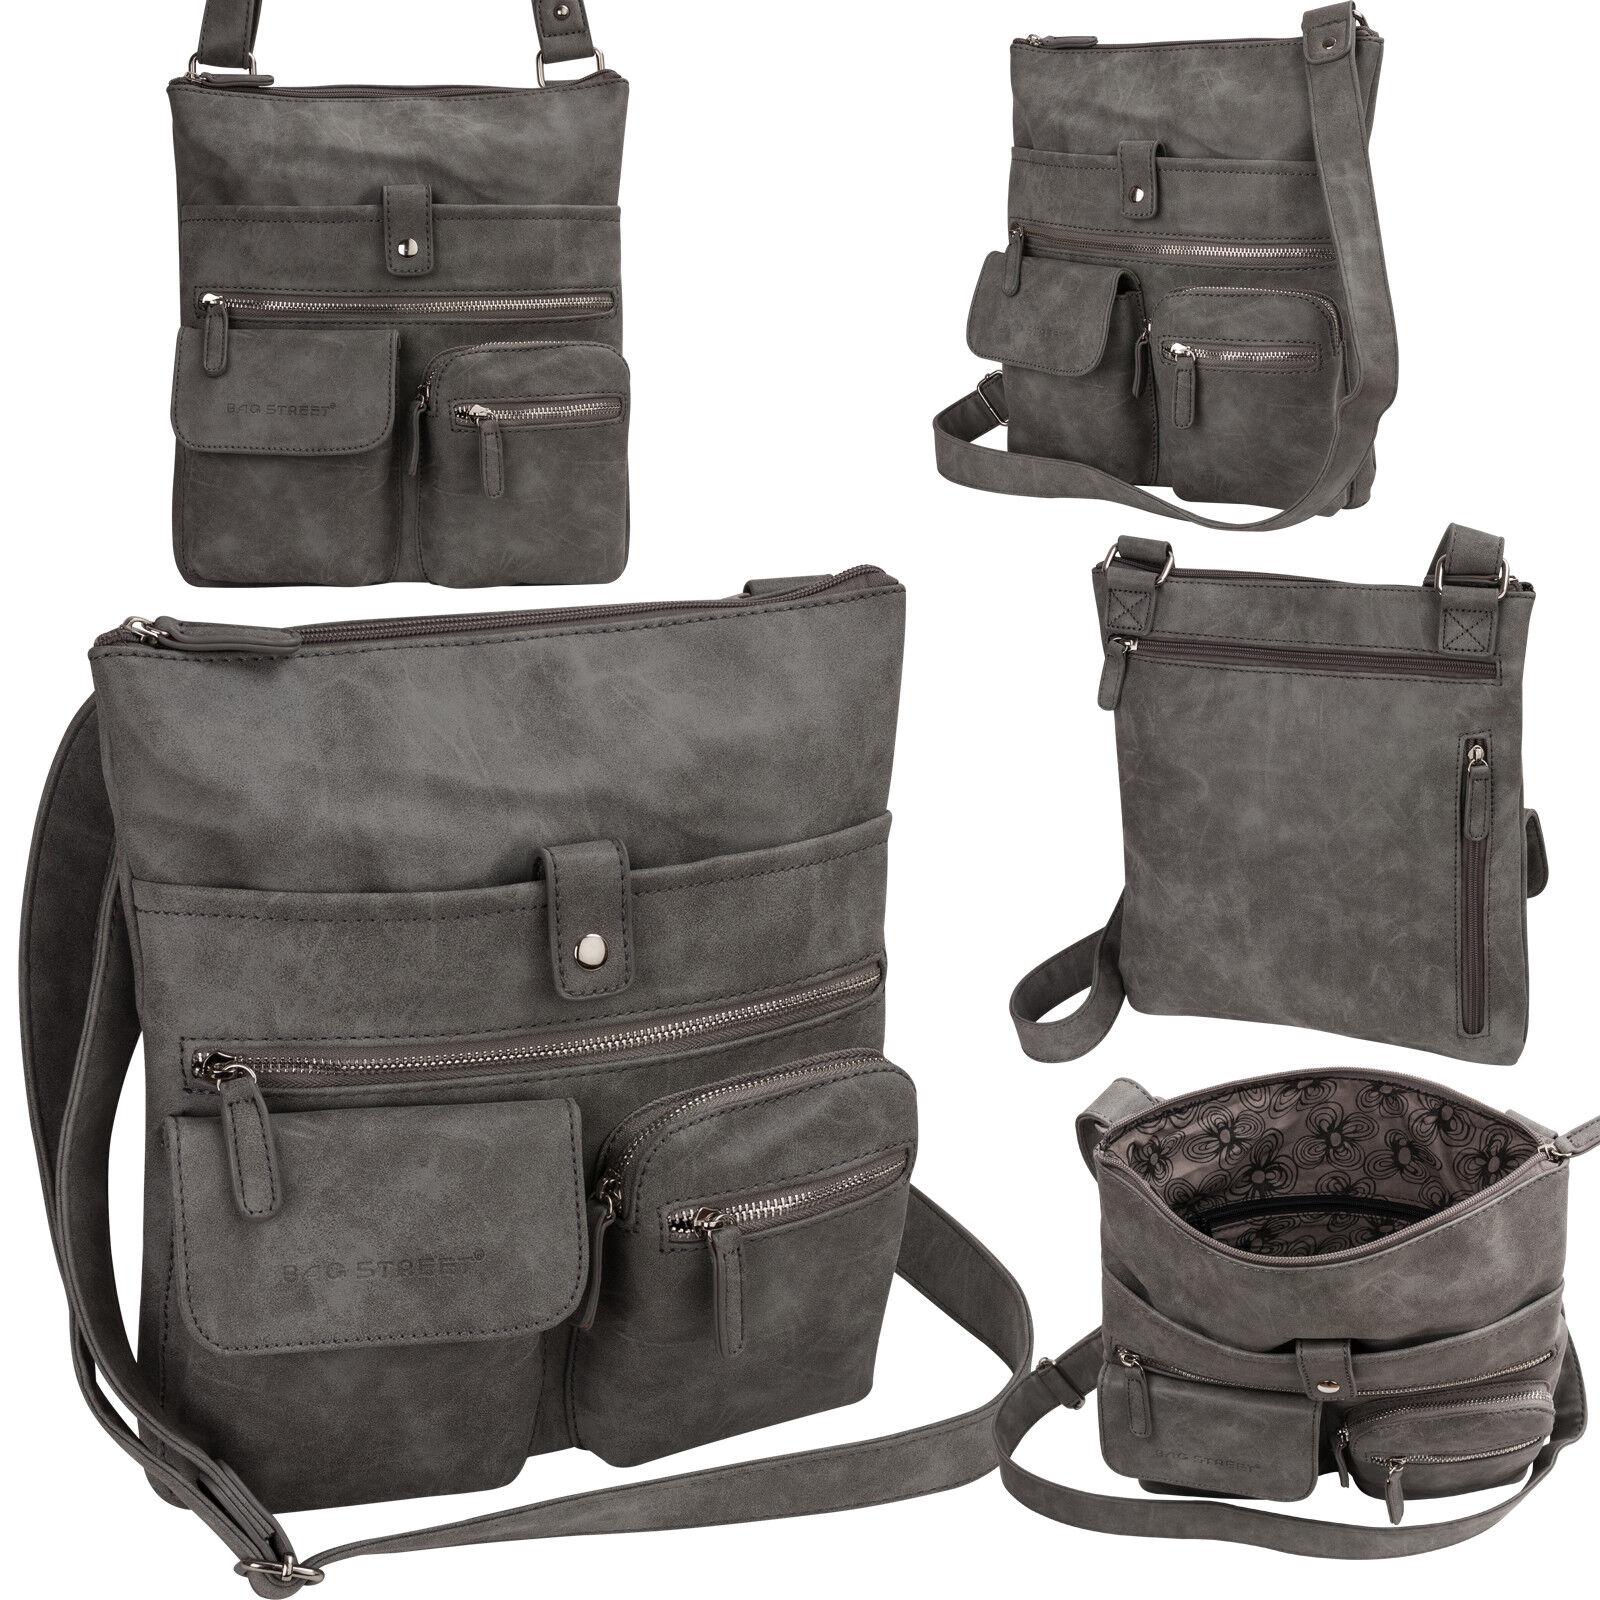 Bag Street Damentasche Umhängetasche Handtasche Schultertasche K2 T0100 Grau